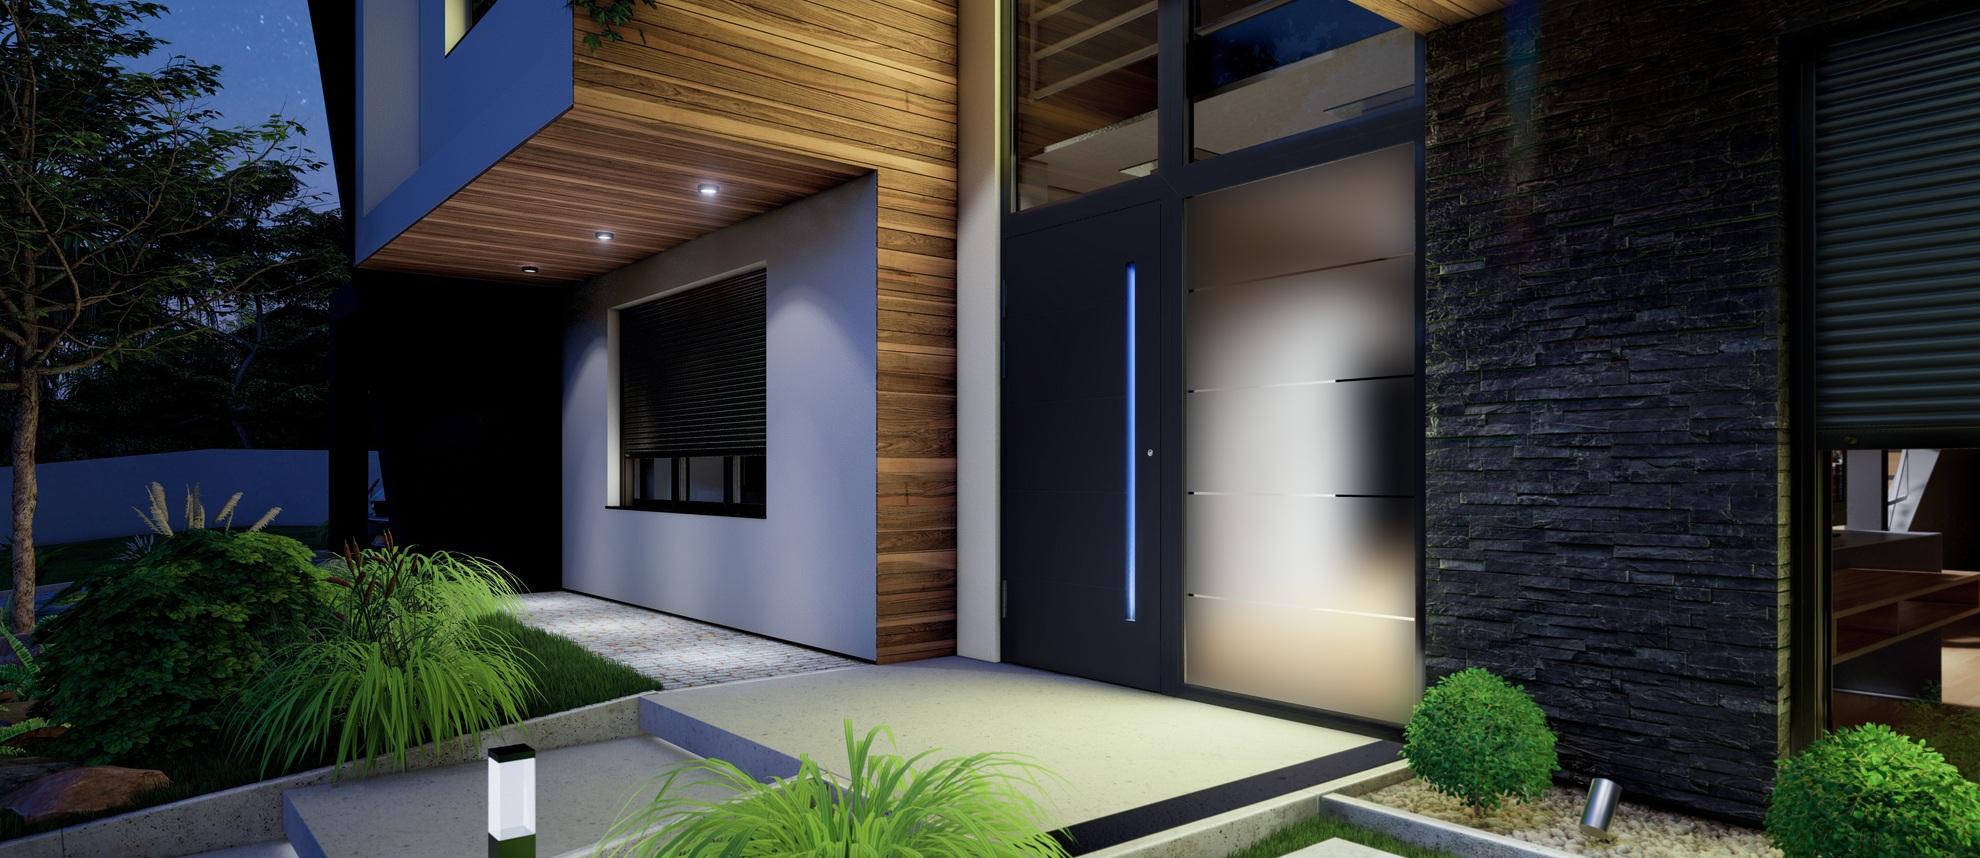 Porte d'entrée villa en aluminium